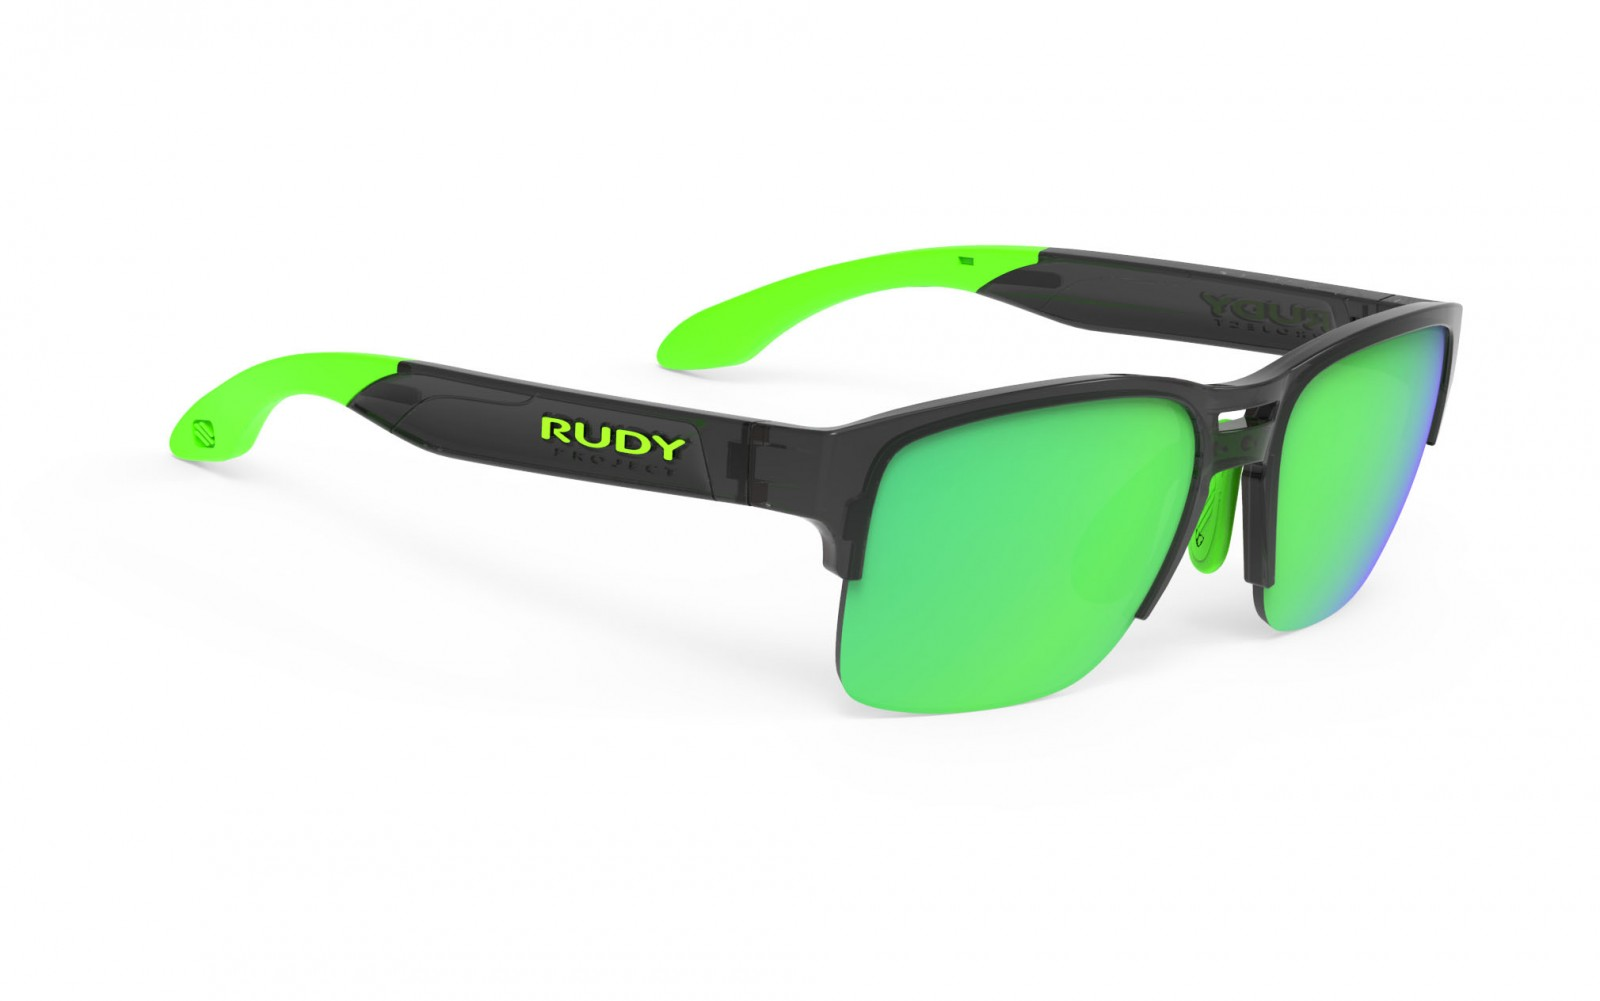 thumb-SPINAIR 58 Crystal Graphite / Polar 3FX HDR Multilaser Green